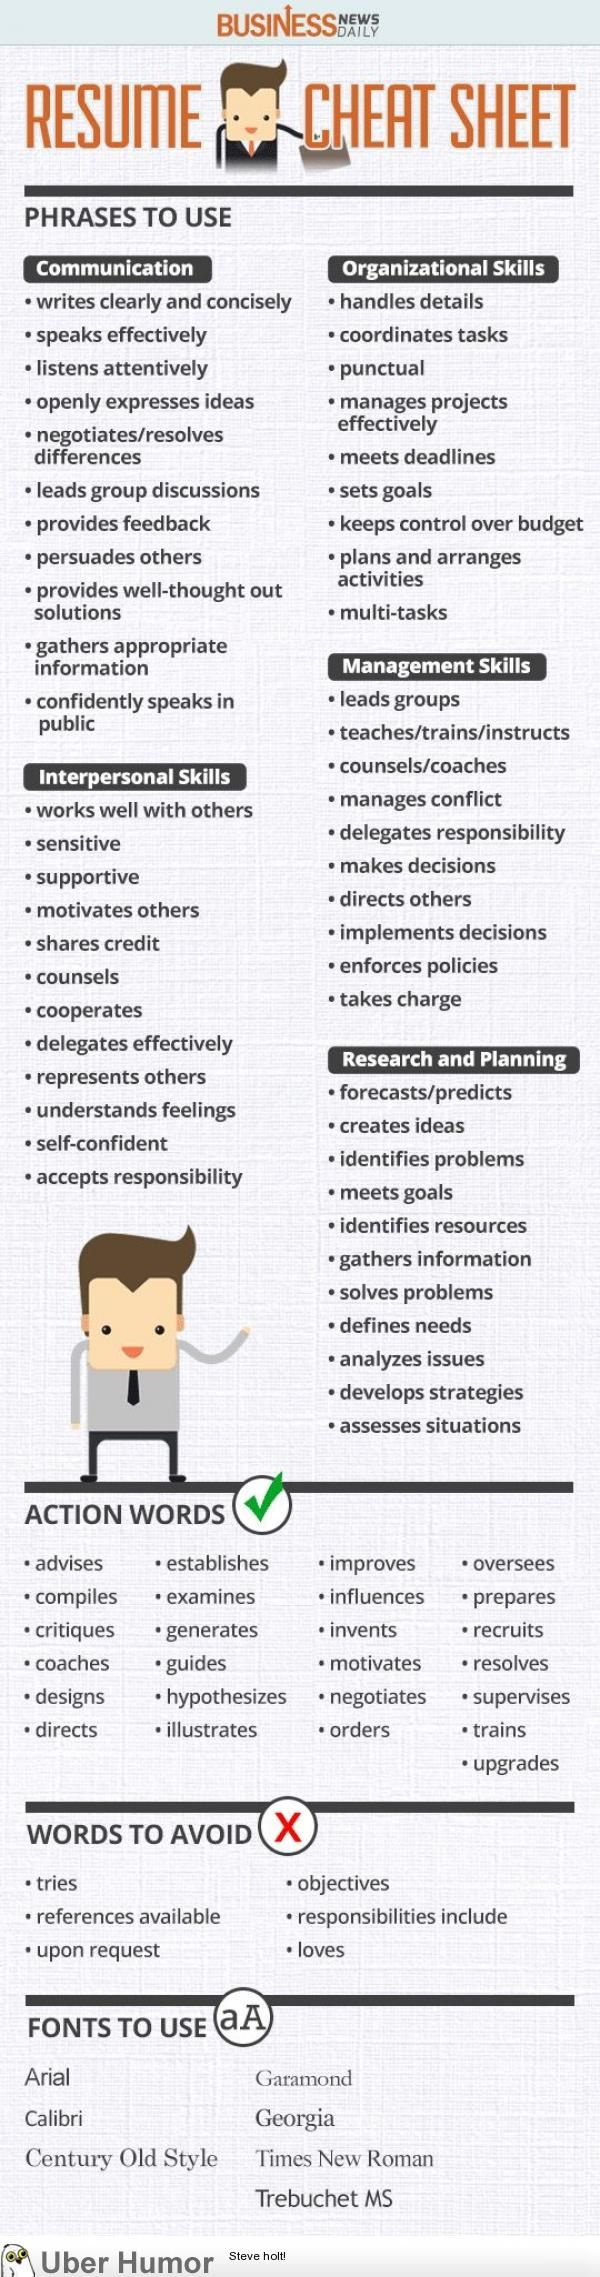 Resume Cheat Sheet | Resumes | Pinterest